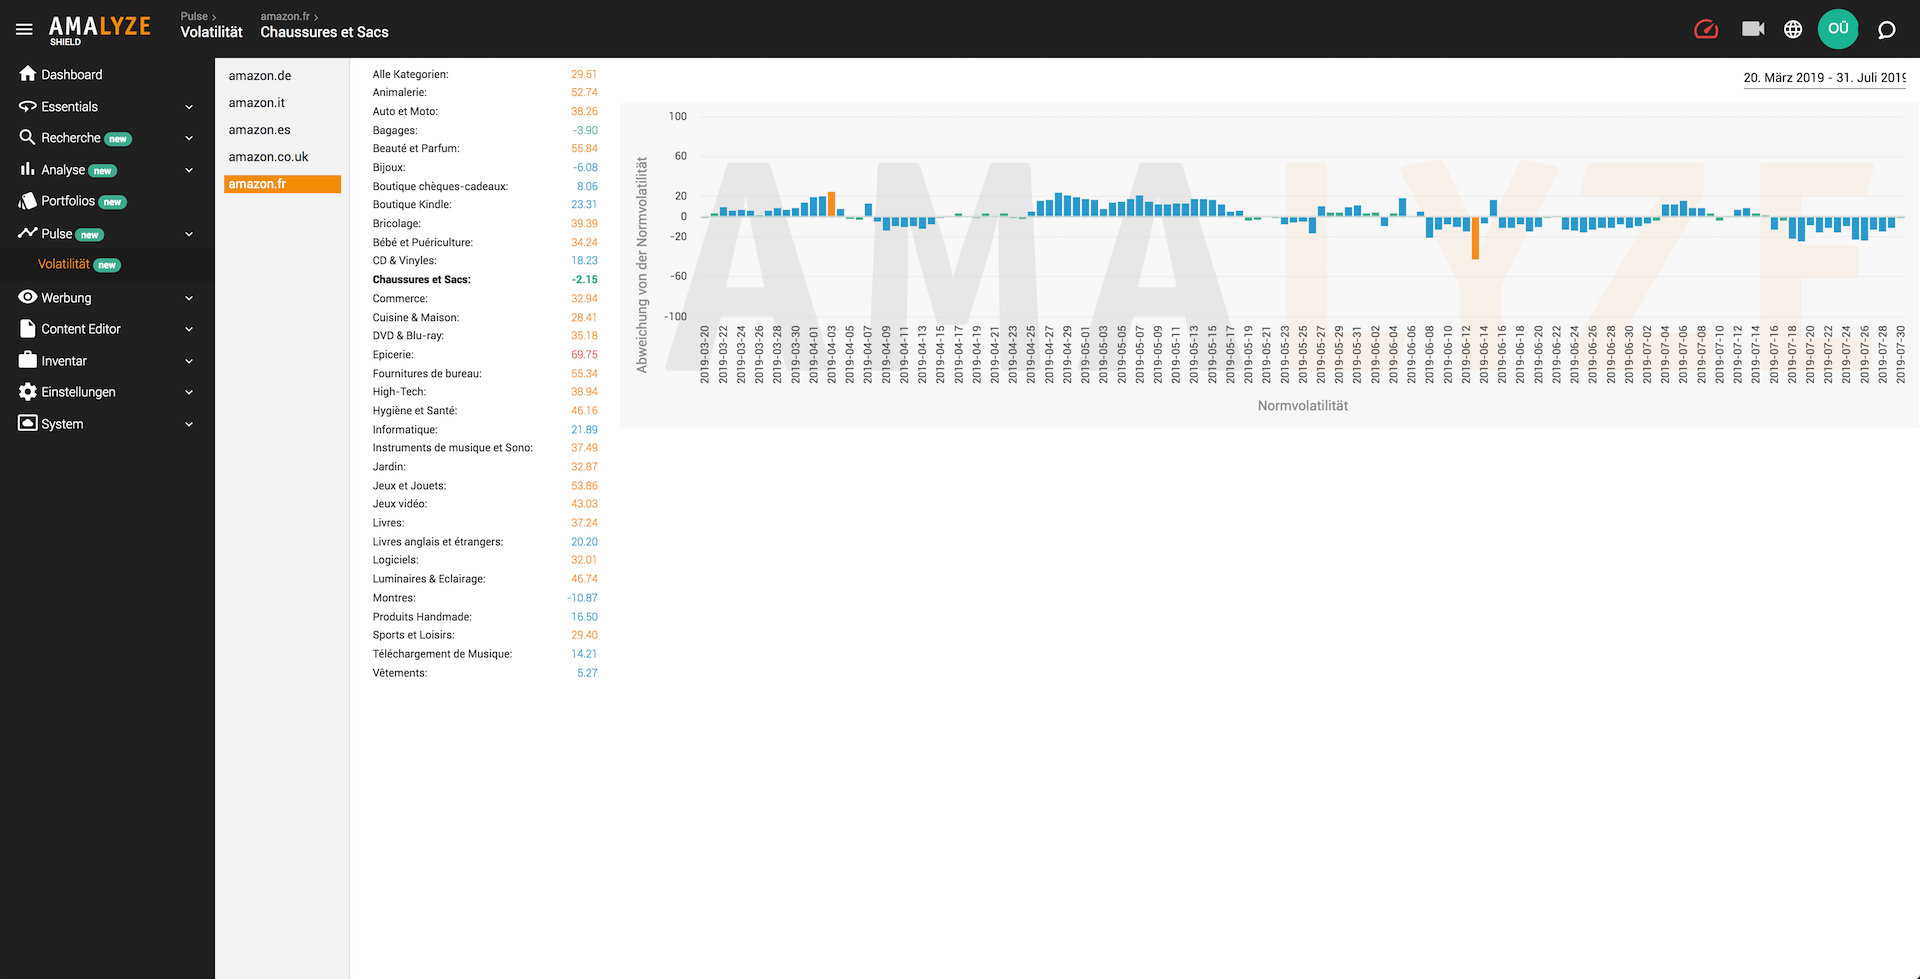 AMALYZE Shield Pulse_Auswertung Normvolatilität_Niedrige Abweichung